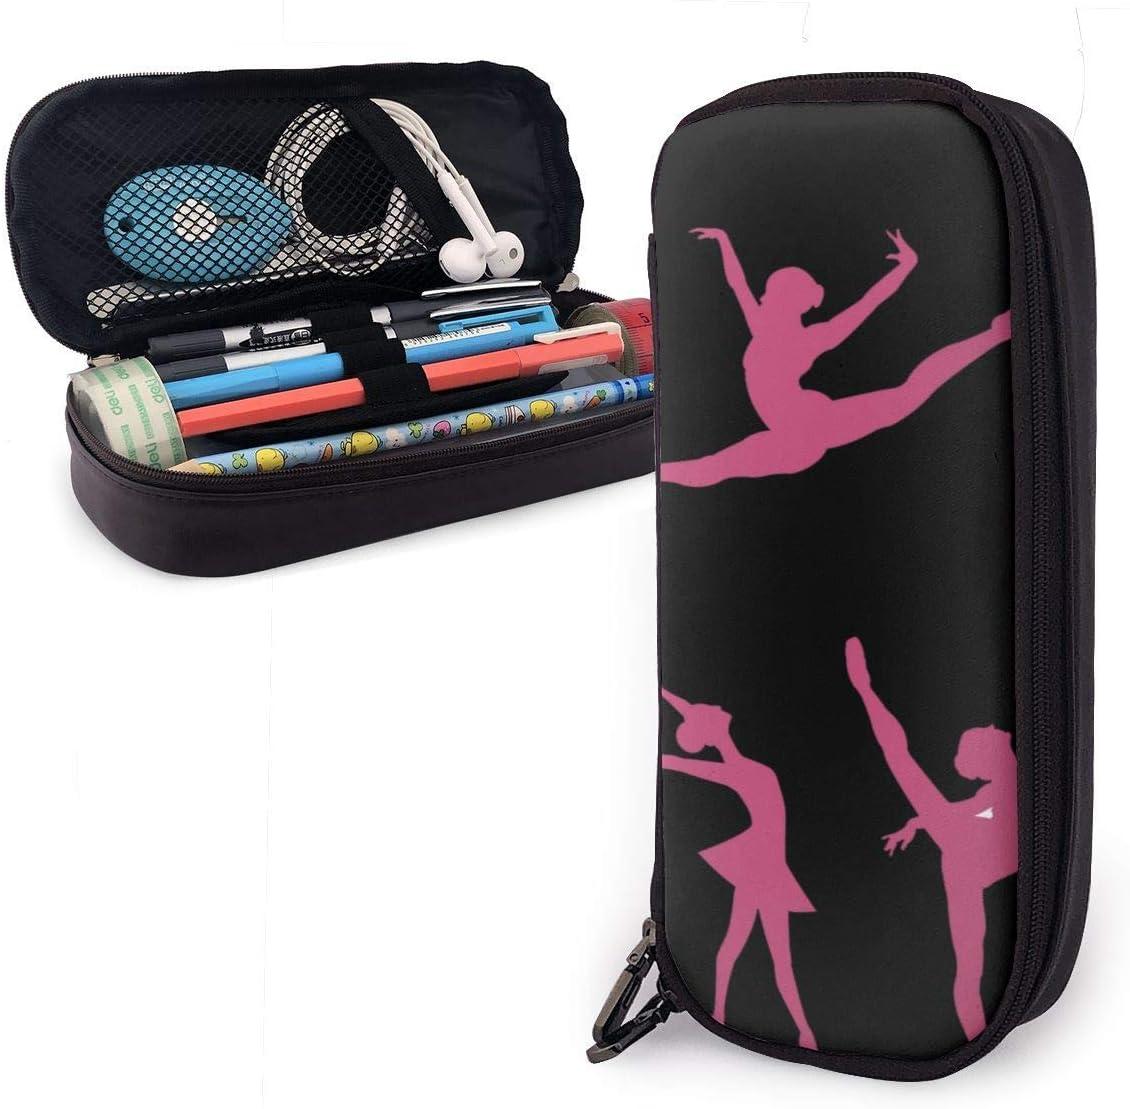 Estuche Escolar de Gran Capacidad, Bolsa de Lápiz Organizador para Material Papelería con Cremallera Doble Gimnasia bailarina rosa para Hombre Mujer Estudiante en Escuela Oficina